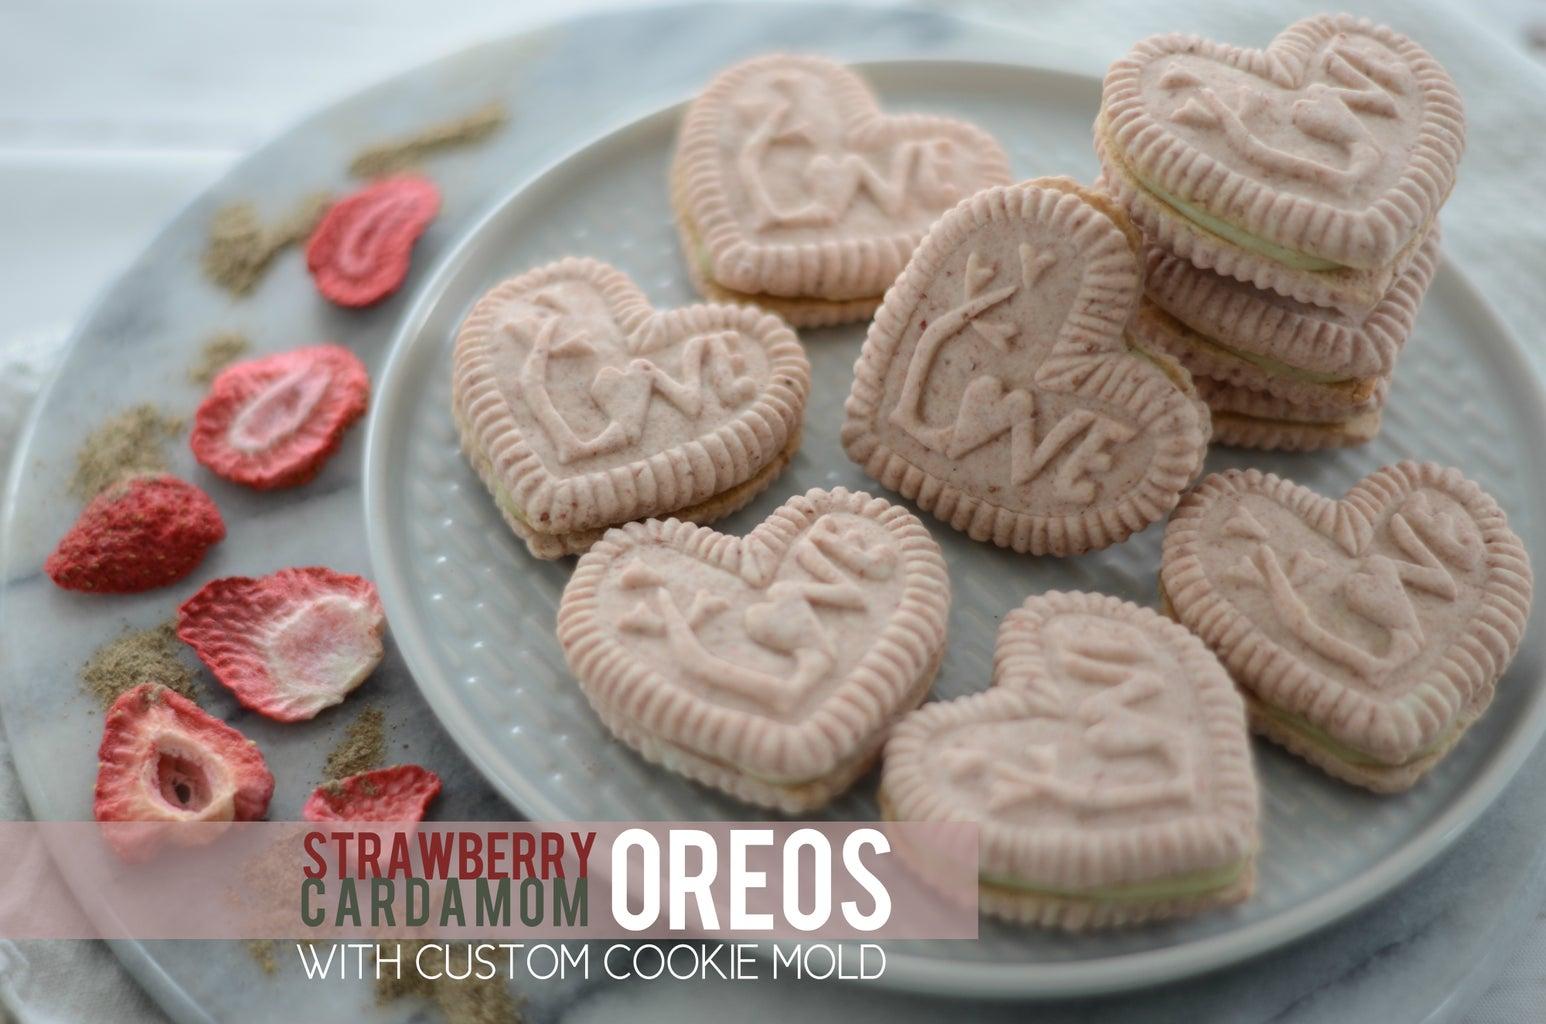 Strawberry Cardamom Oreos With Custom Cookie Mold